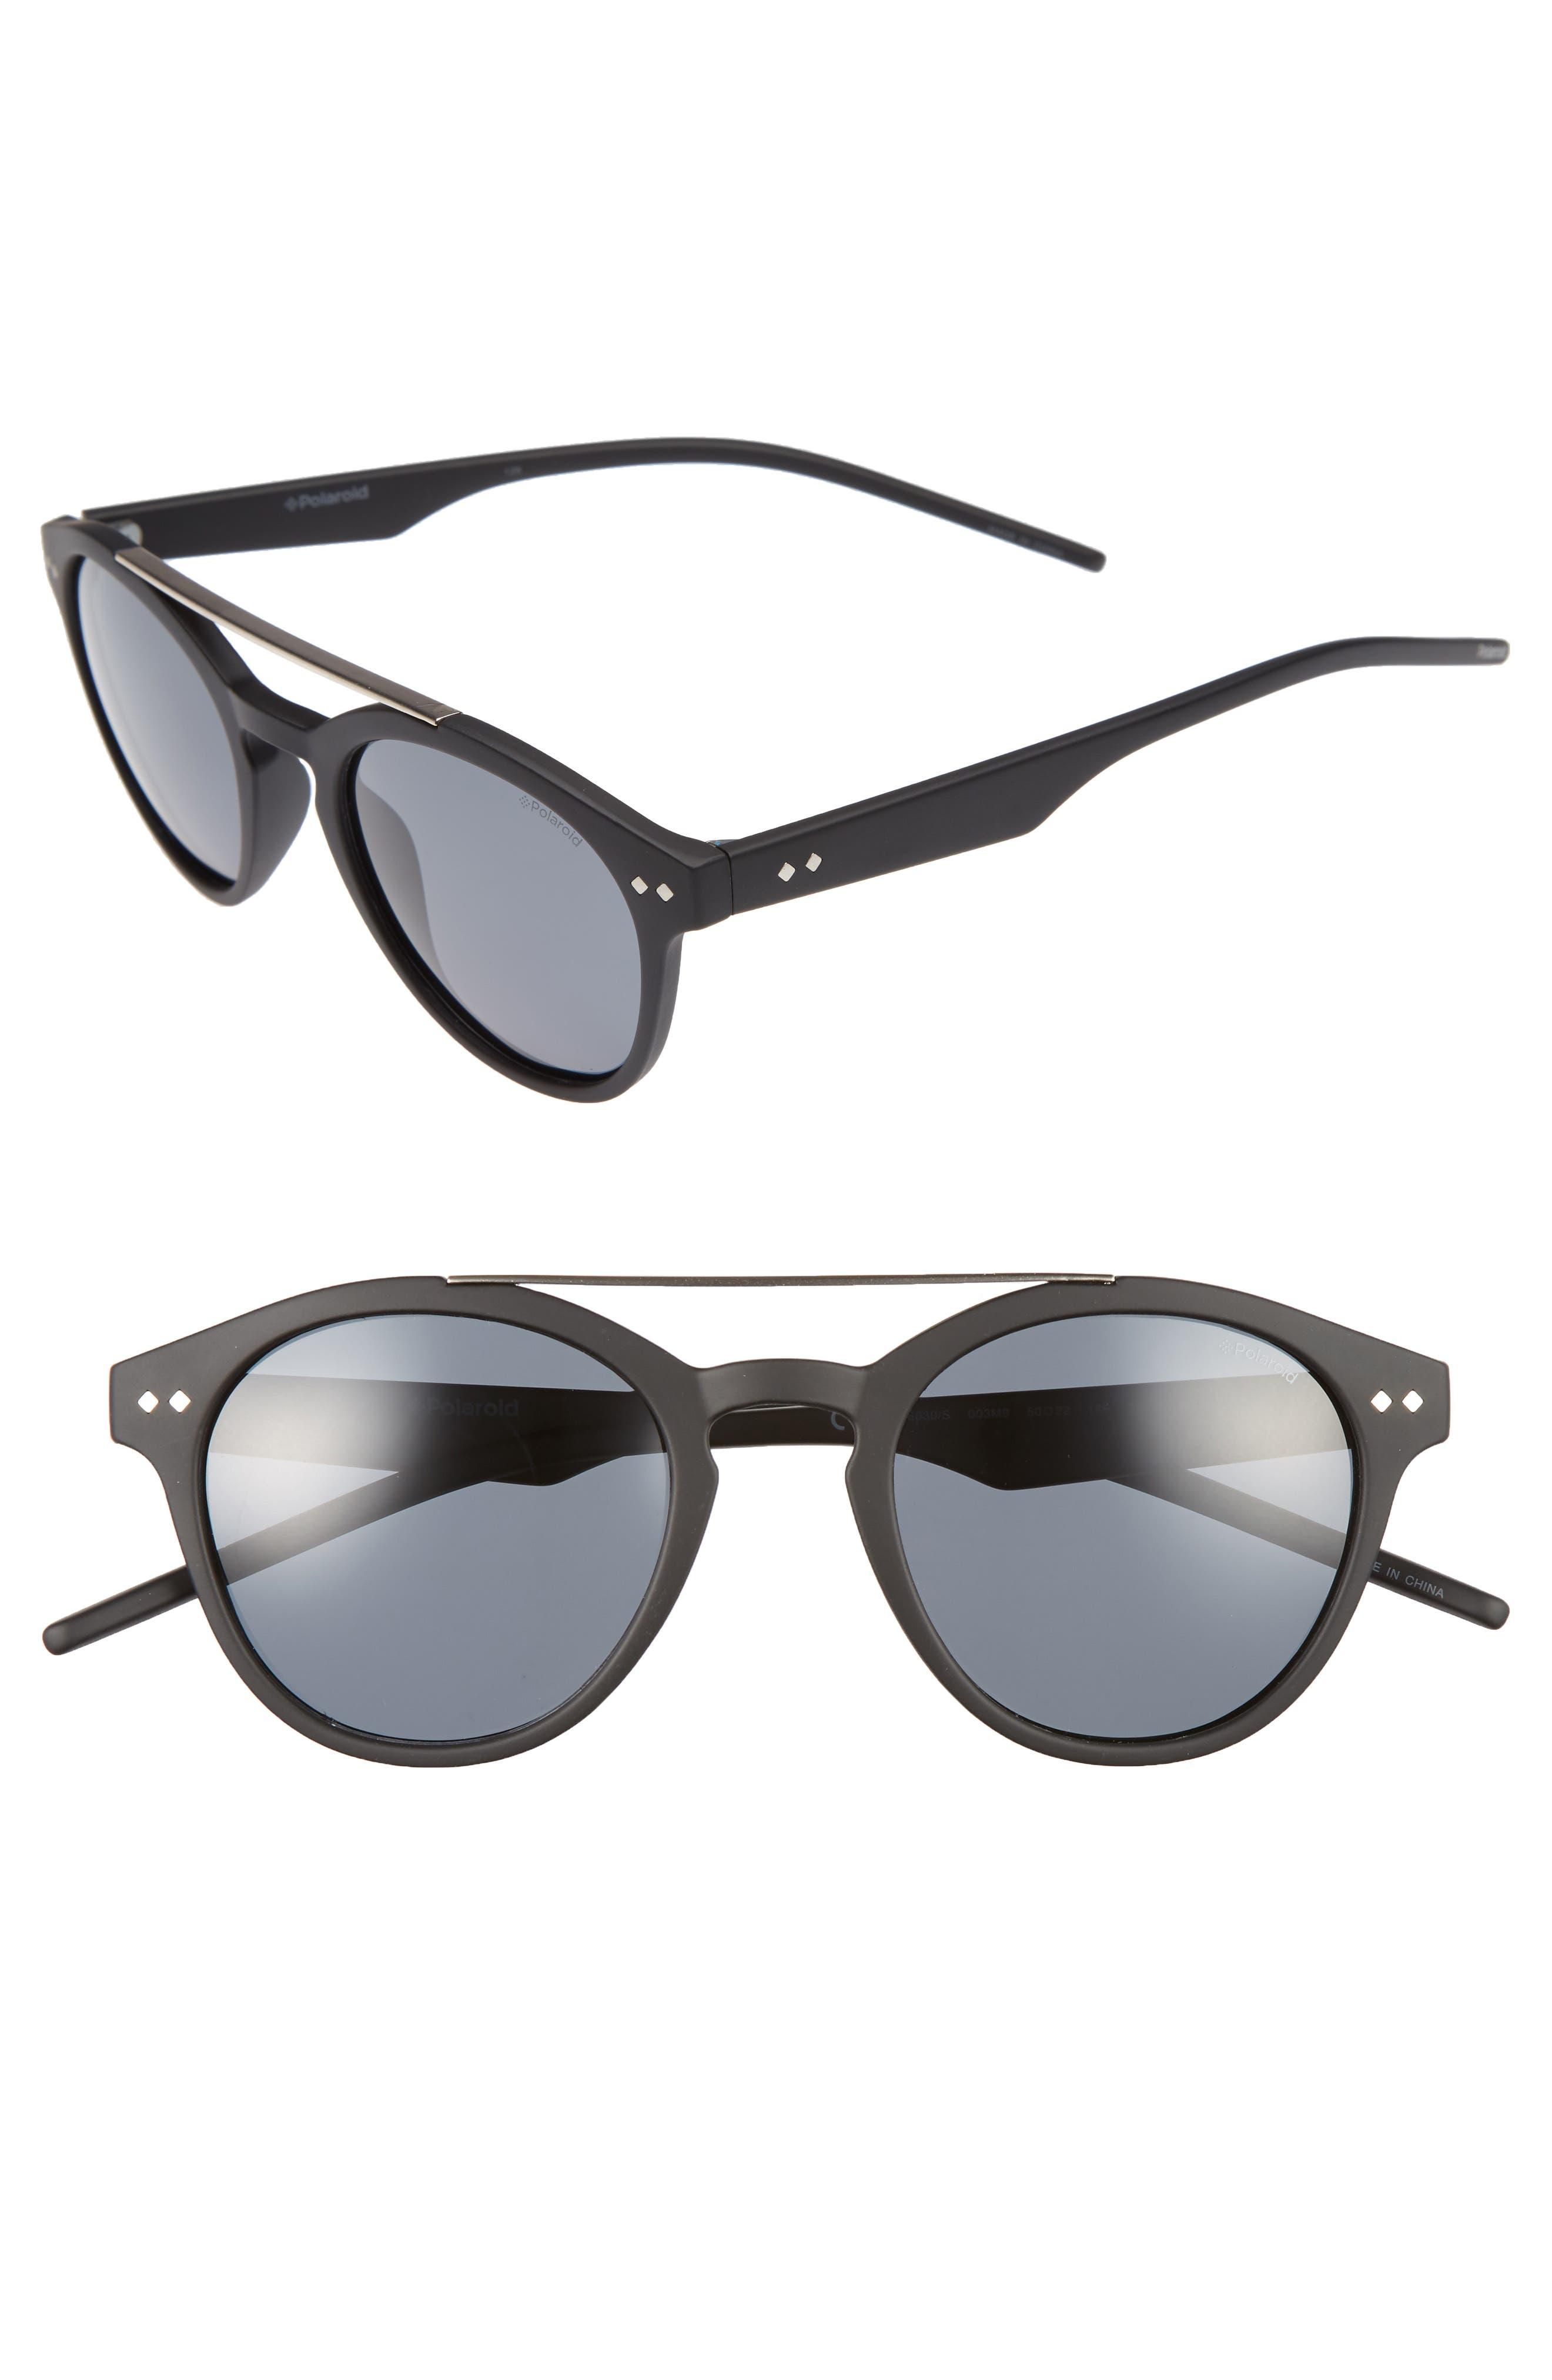 50mm Polarized Retro Sunglasses,                             Main thumbnail 1, color,